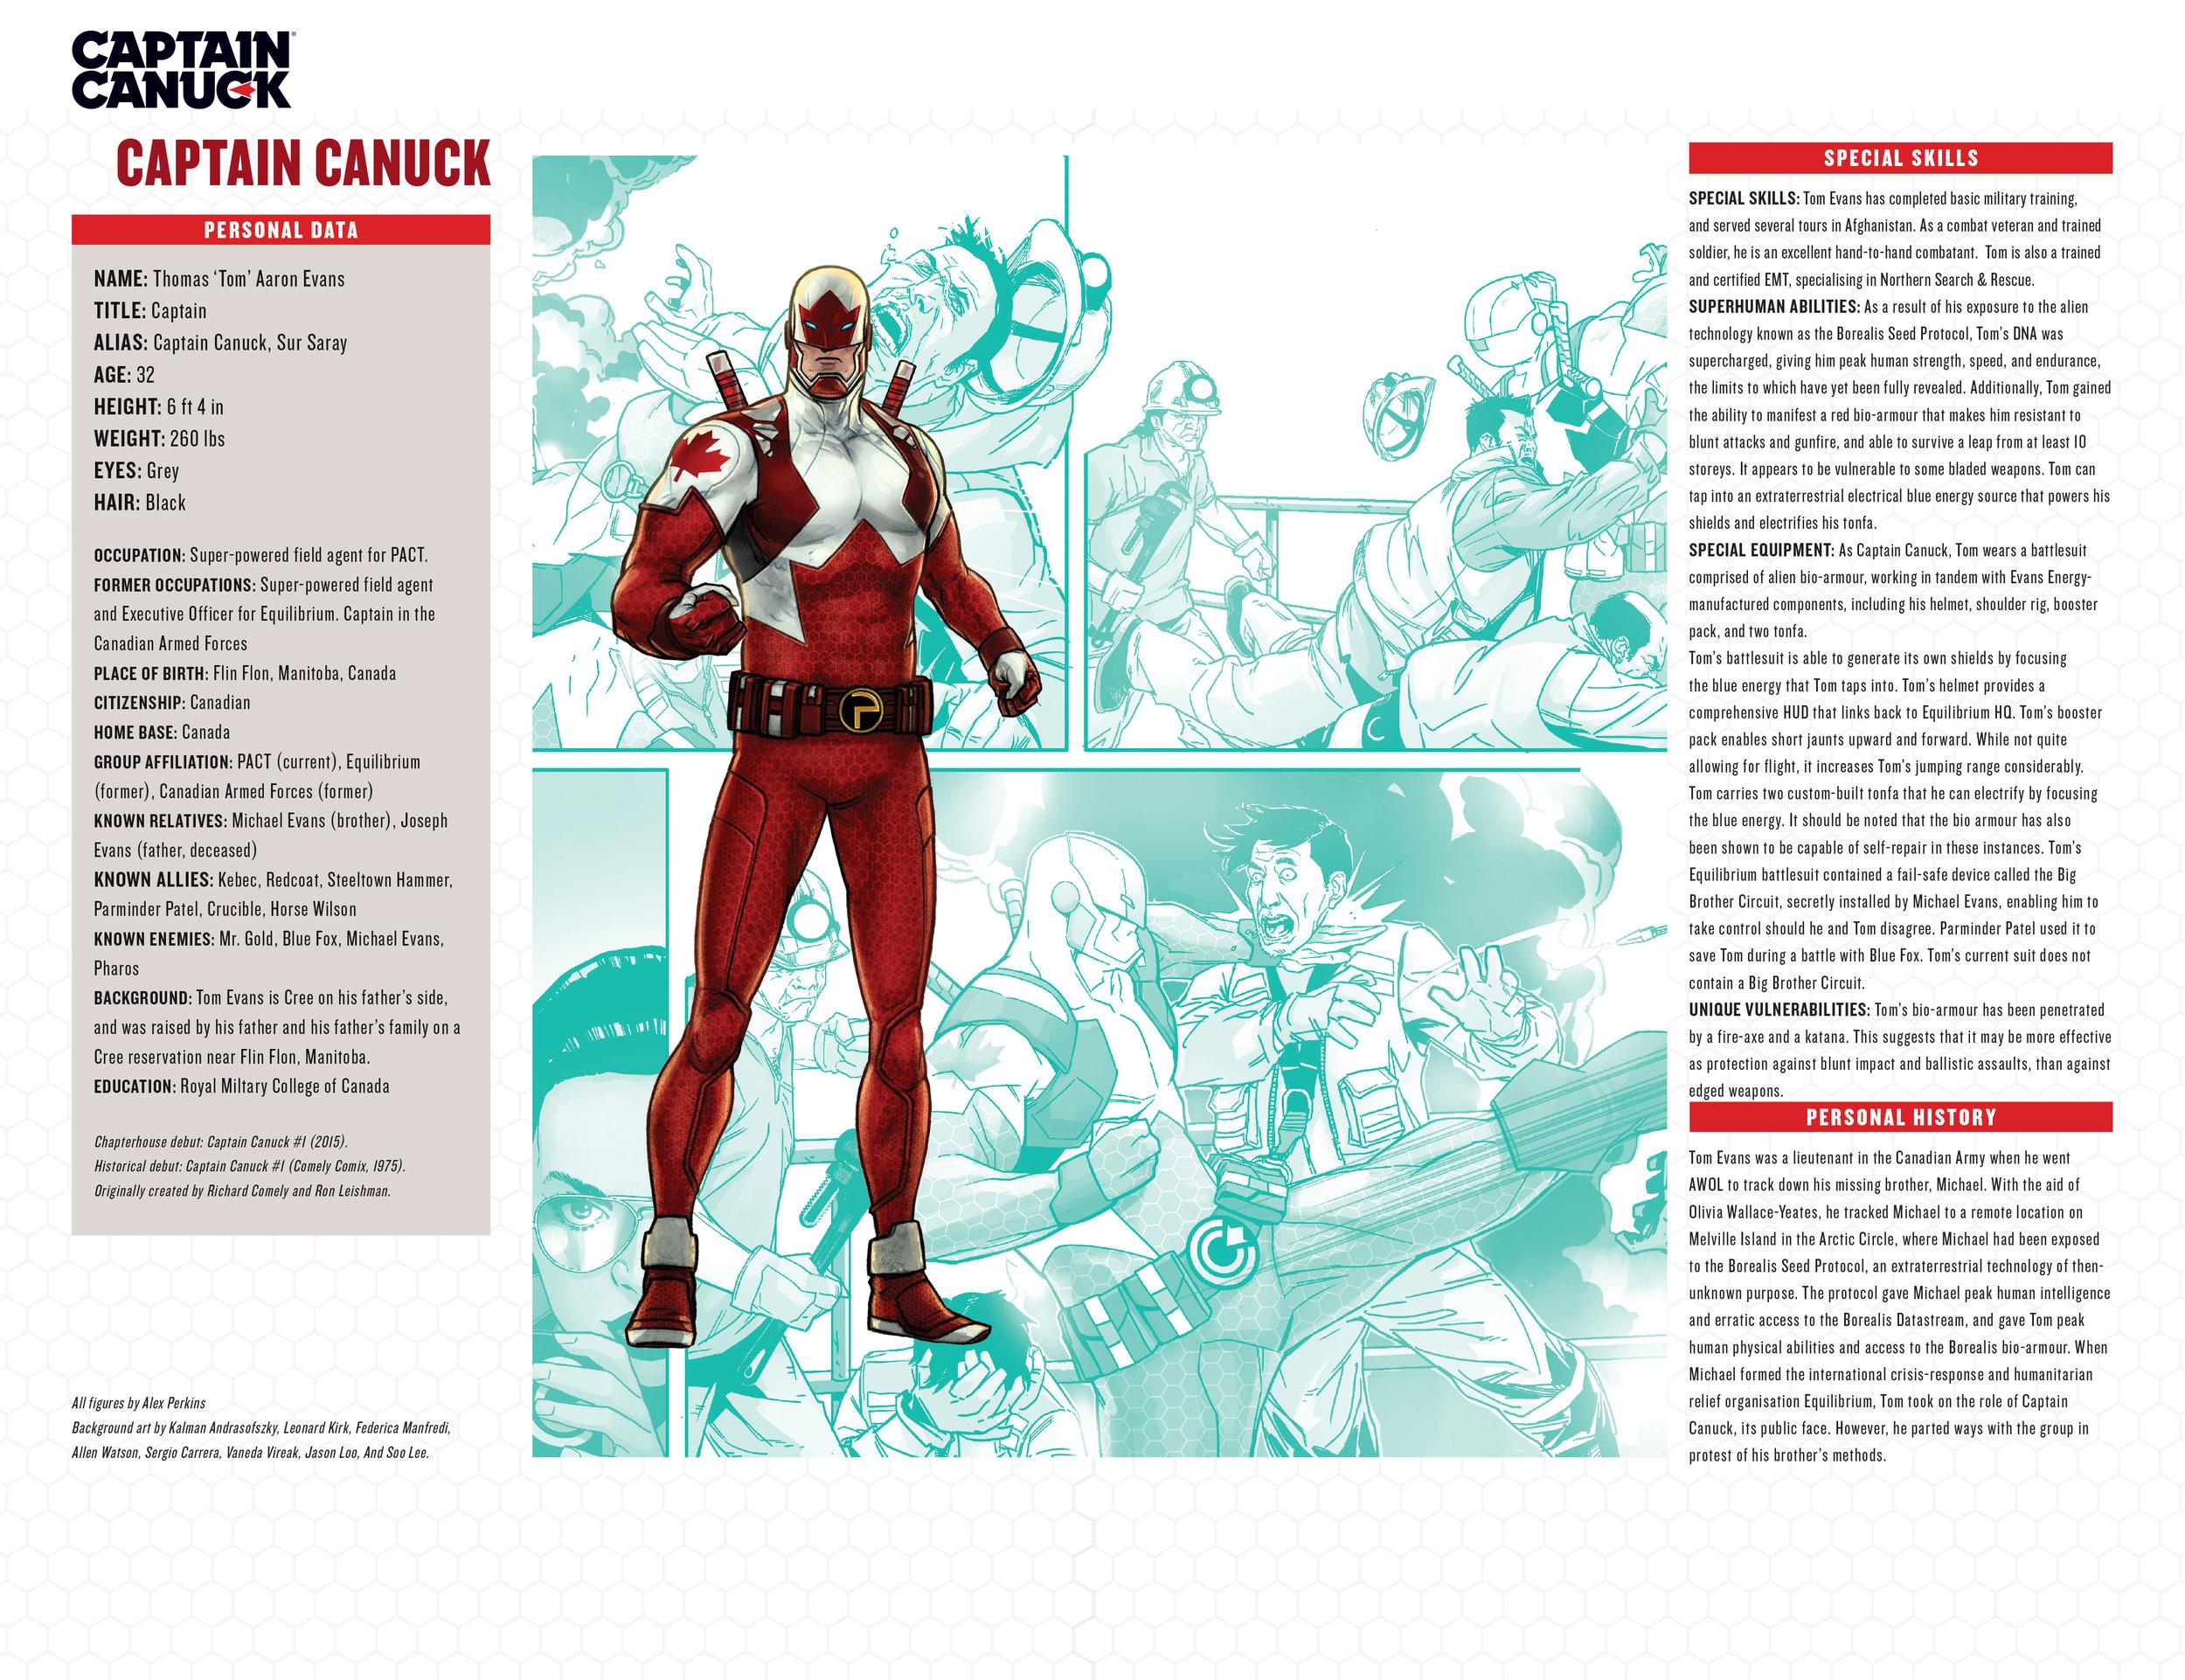 Chapterverse_character-bios_2018-CC.jpg